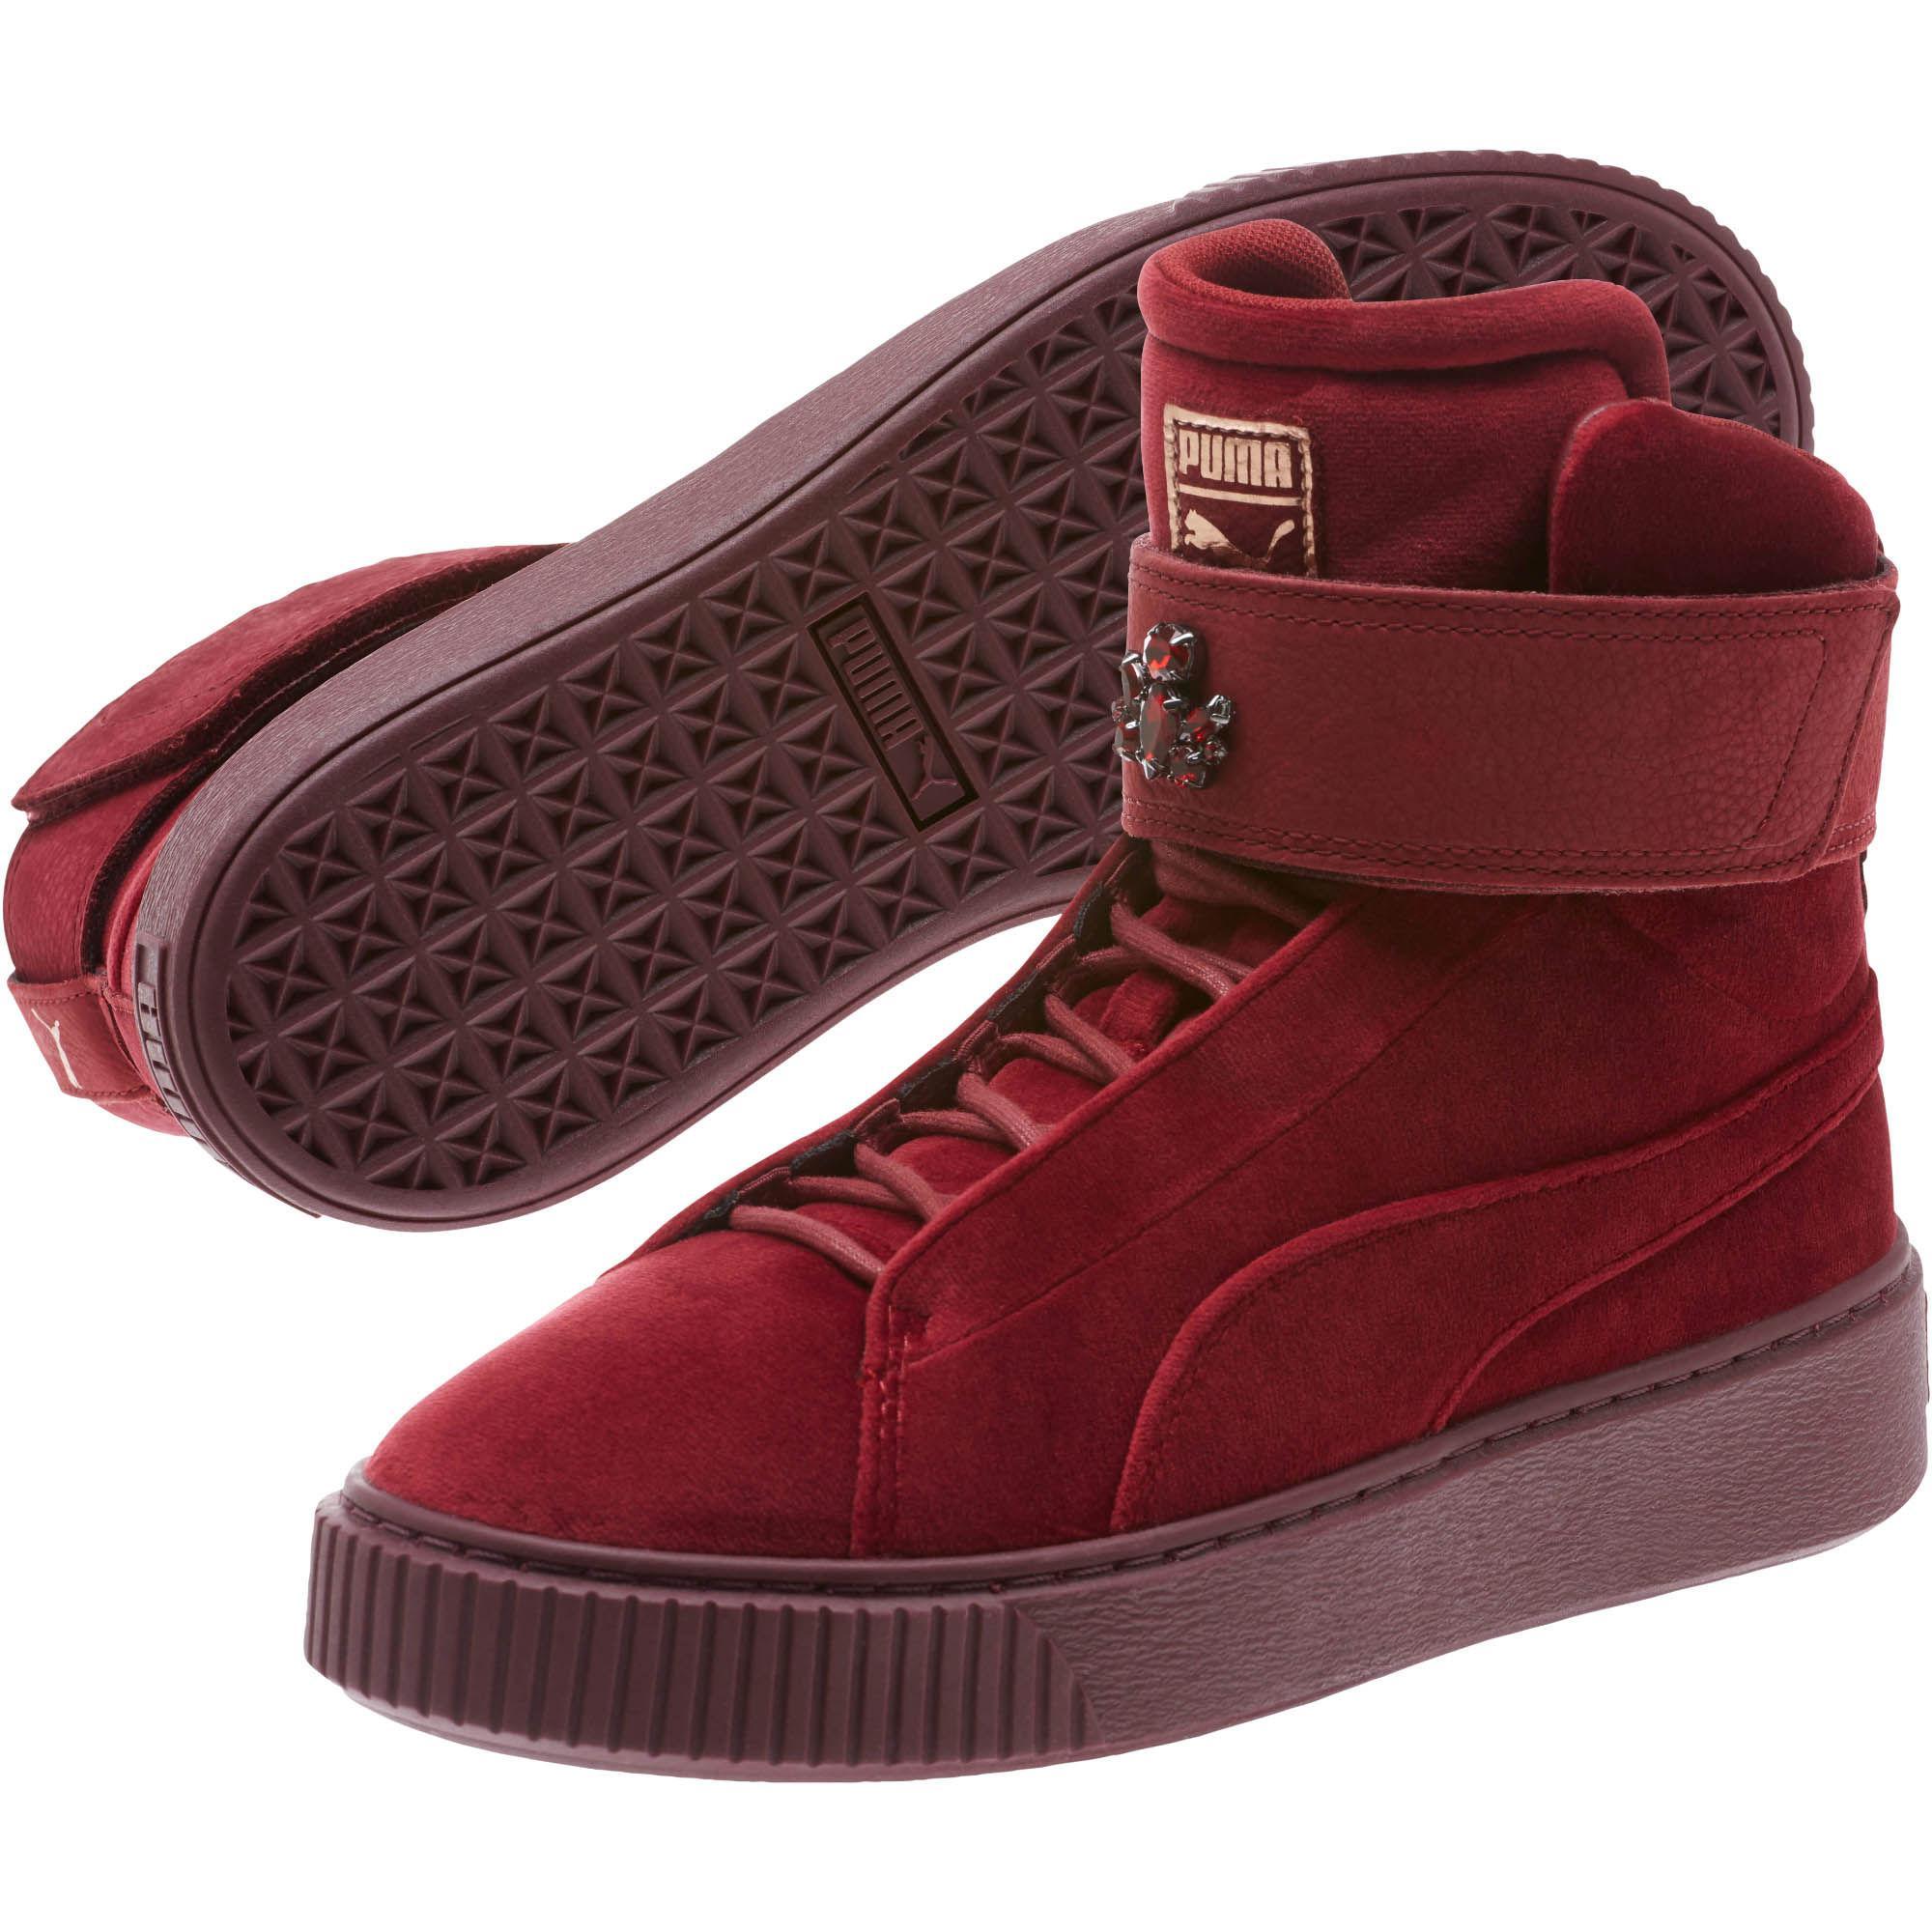 PUMA Leather Platform Mid Velour Women